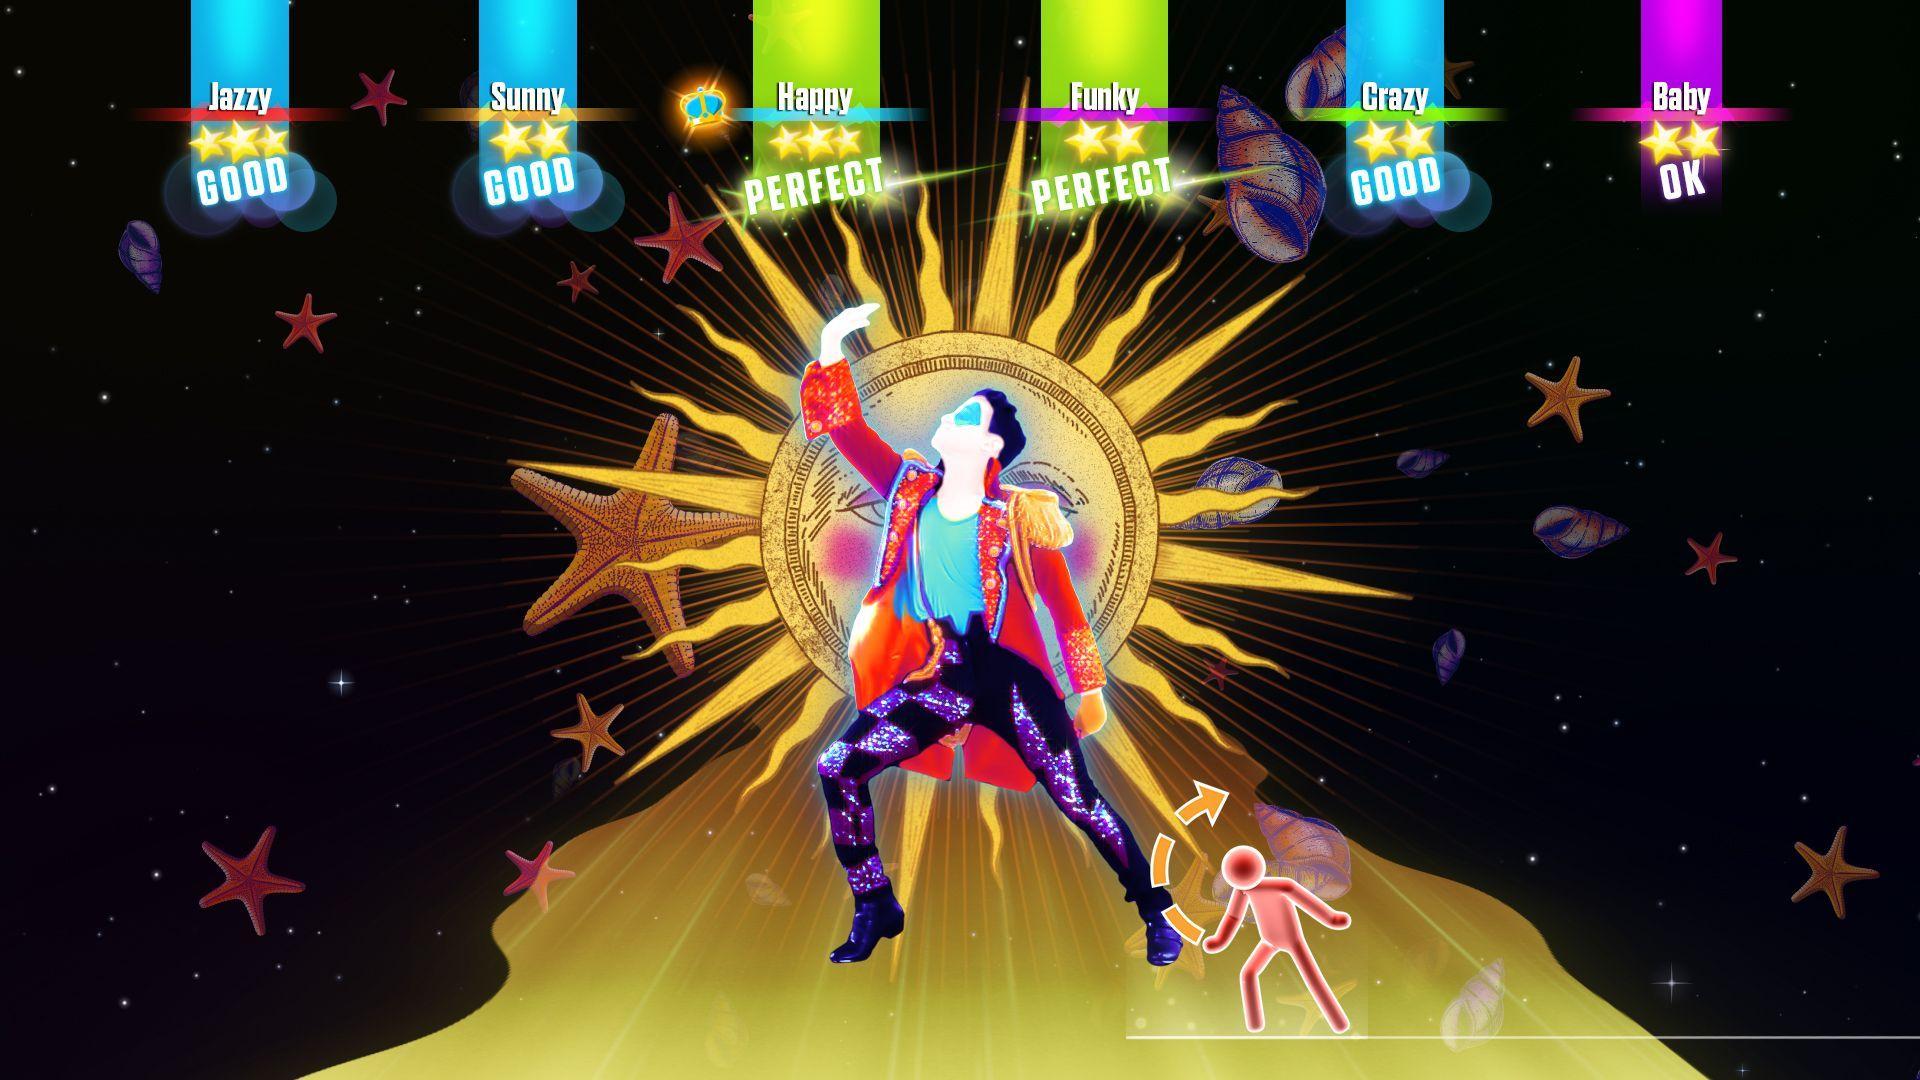 Just Dance 2017 (Nintendo Switch) - 3